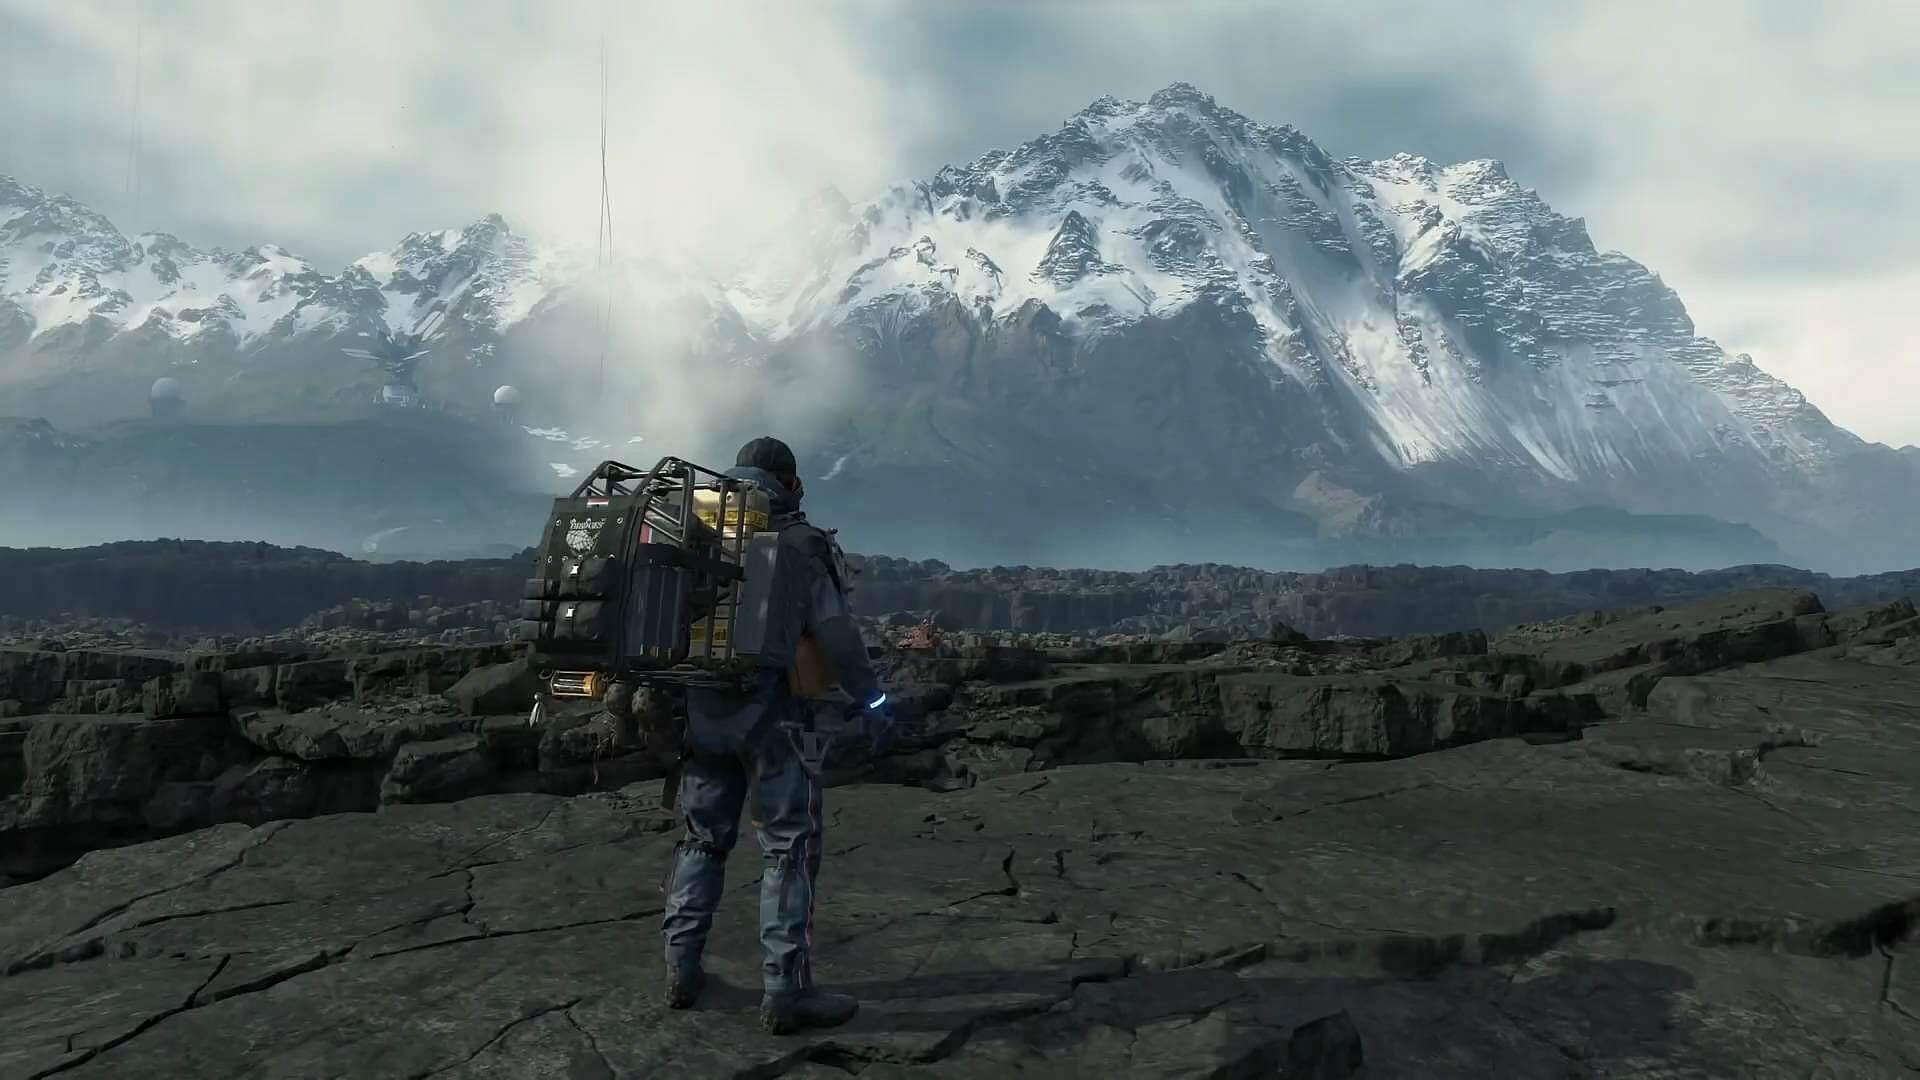 death stranding mountains